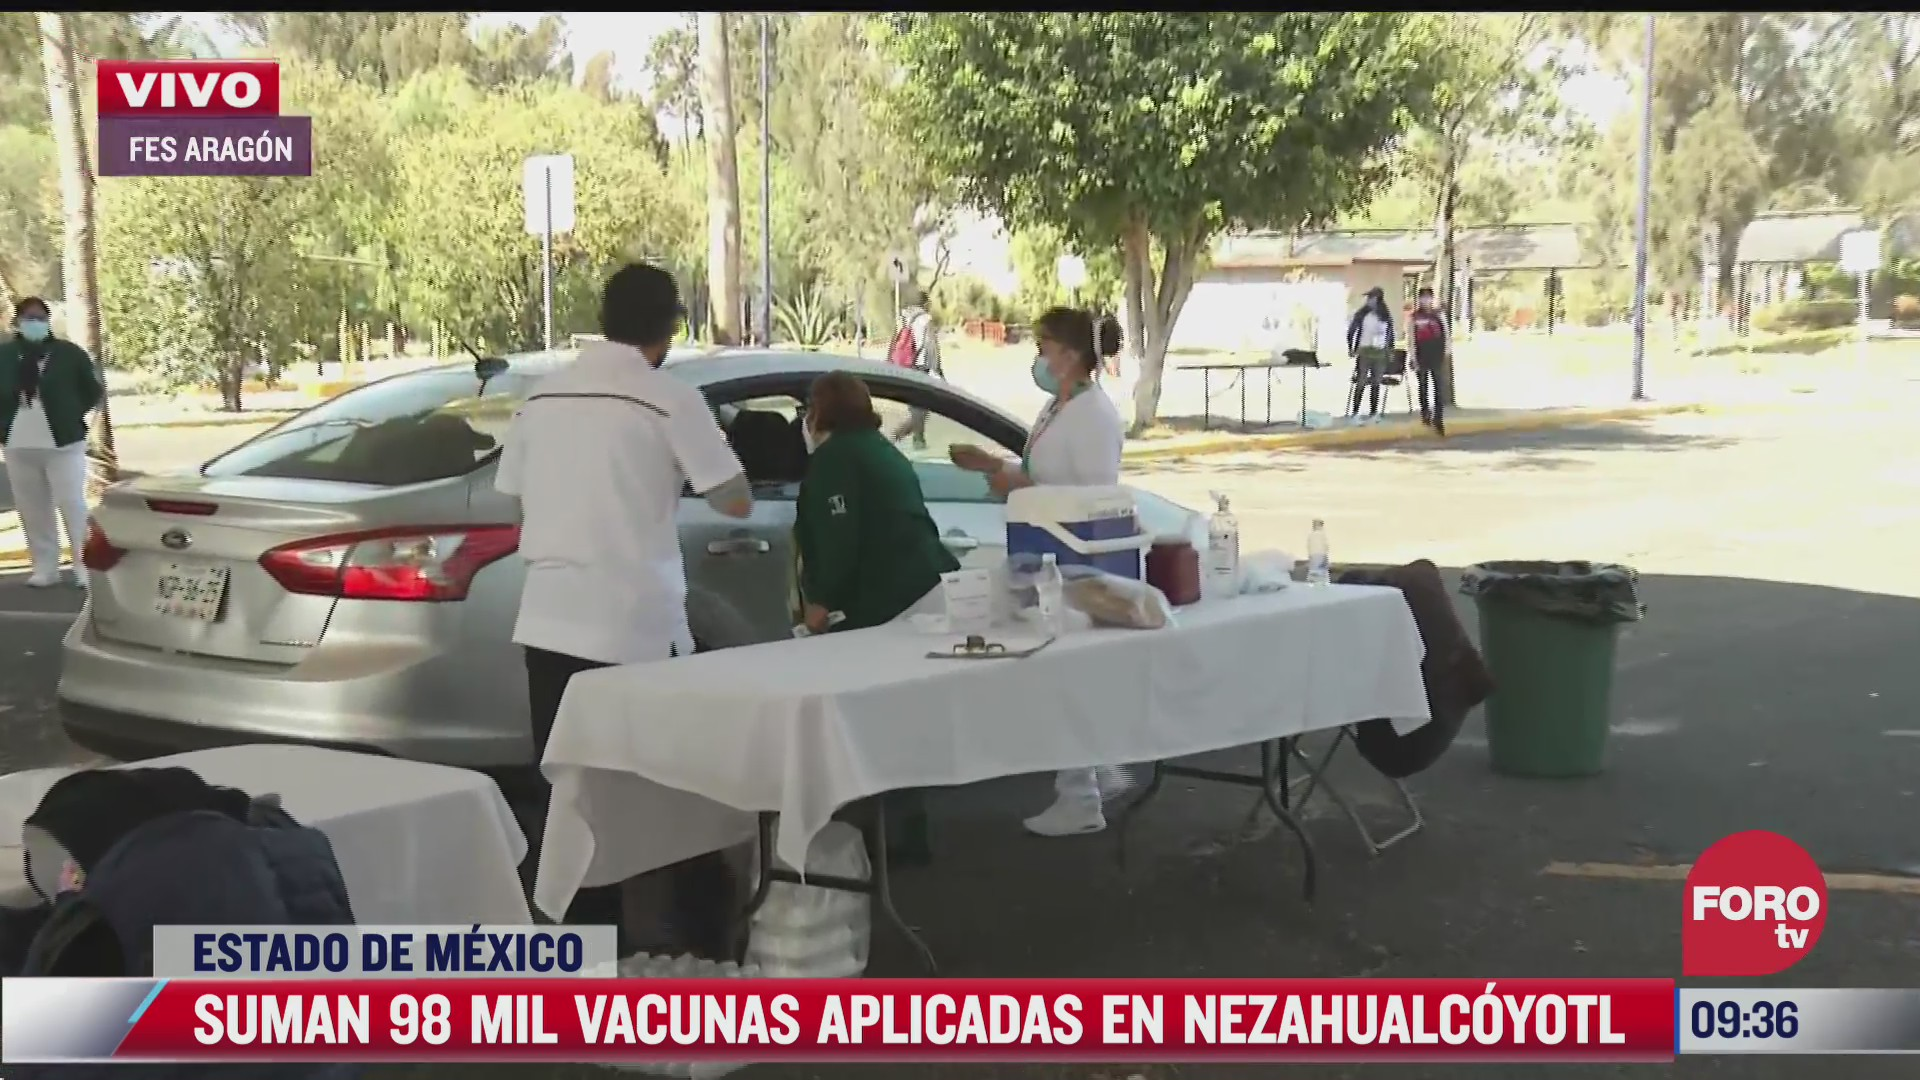 en nezahualcoyotl suman 98 mil vacunas aplicadas contra covid